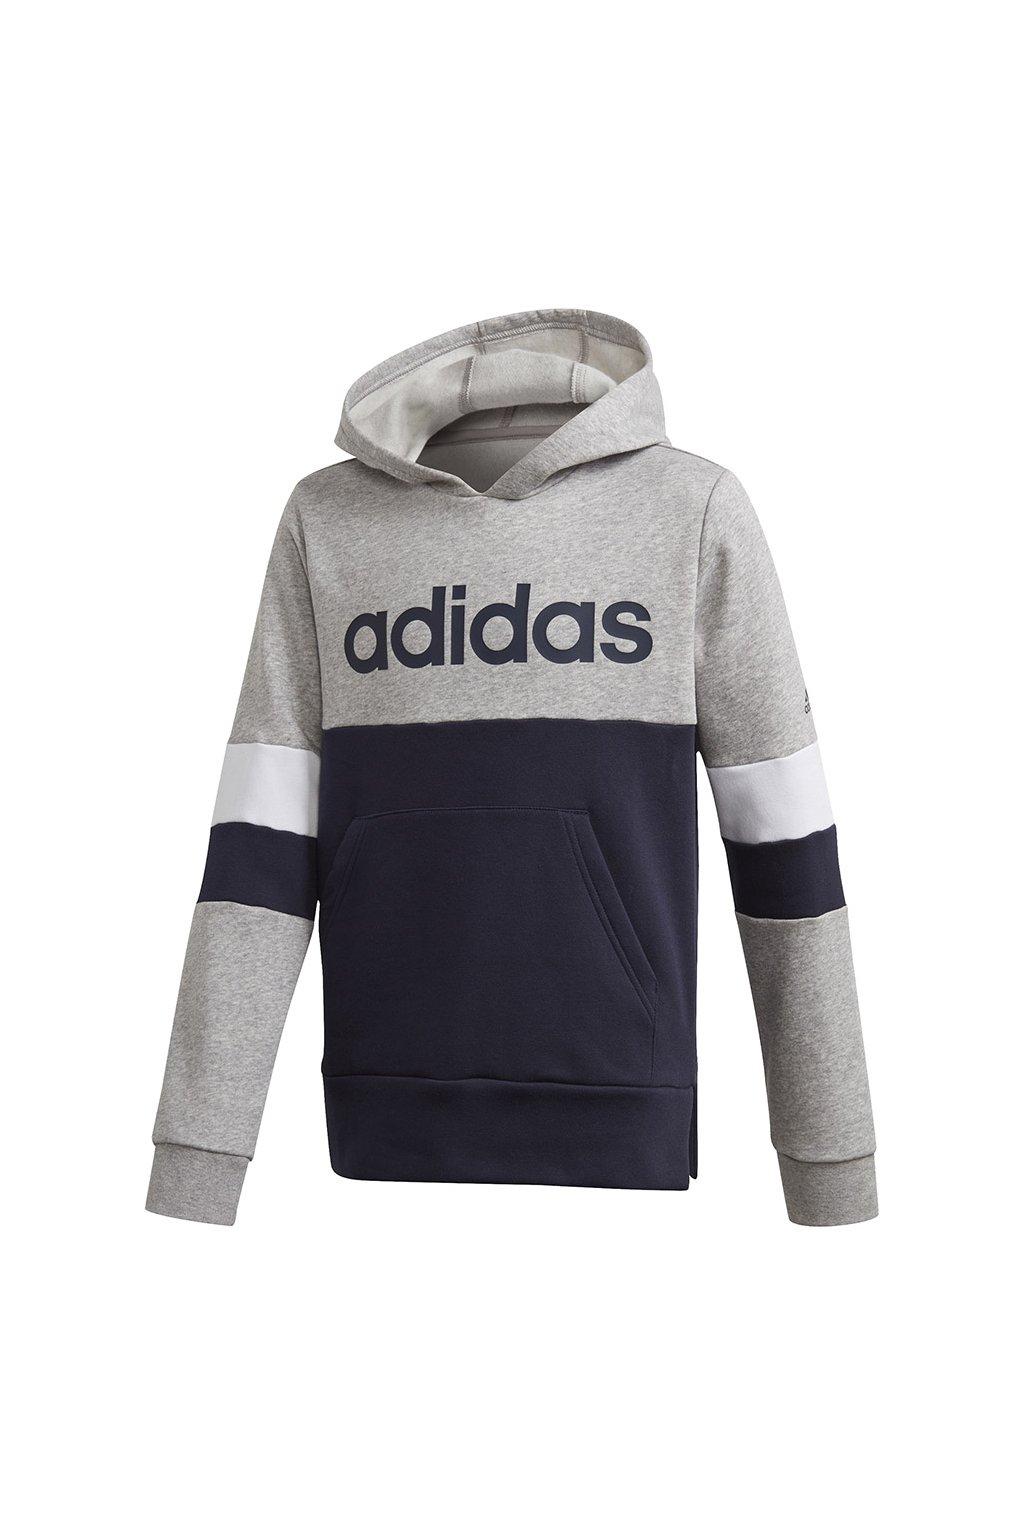 Chlapčenská mikina Adidas Linear Colorbock Hooded Fleece šedo modrá GD6323